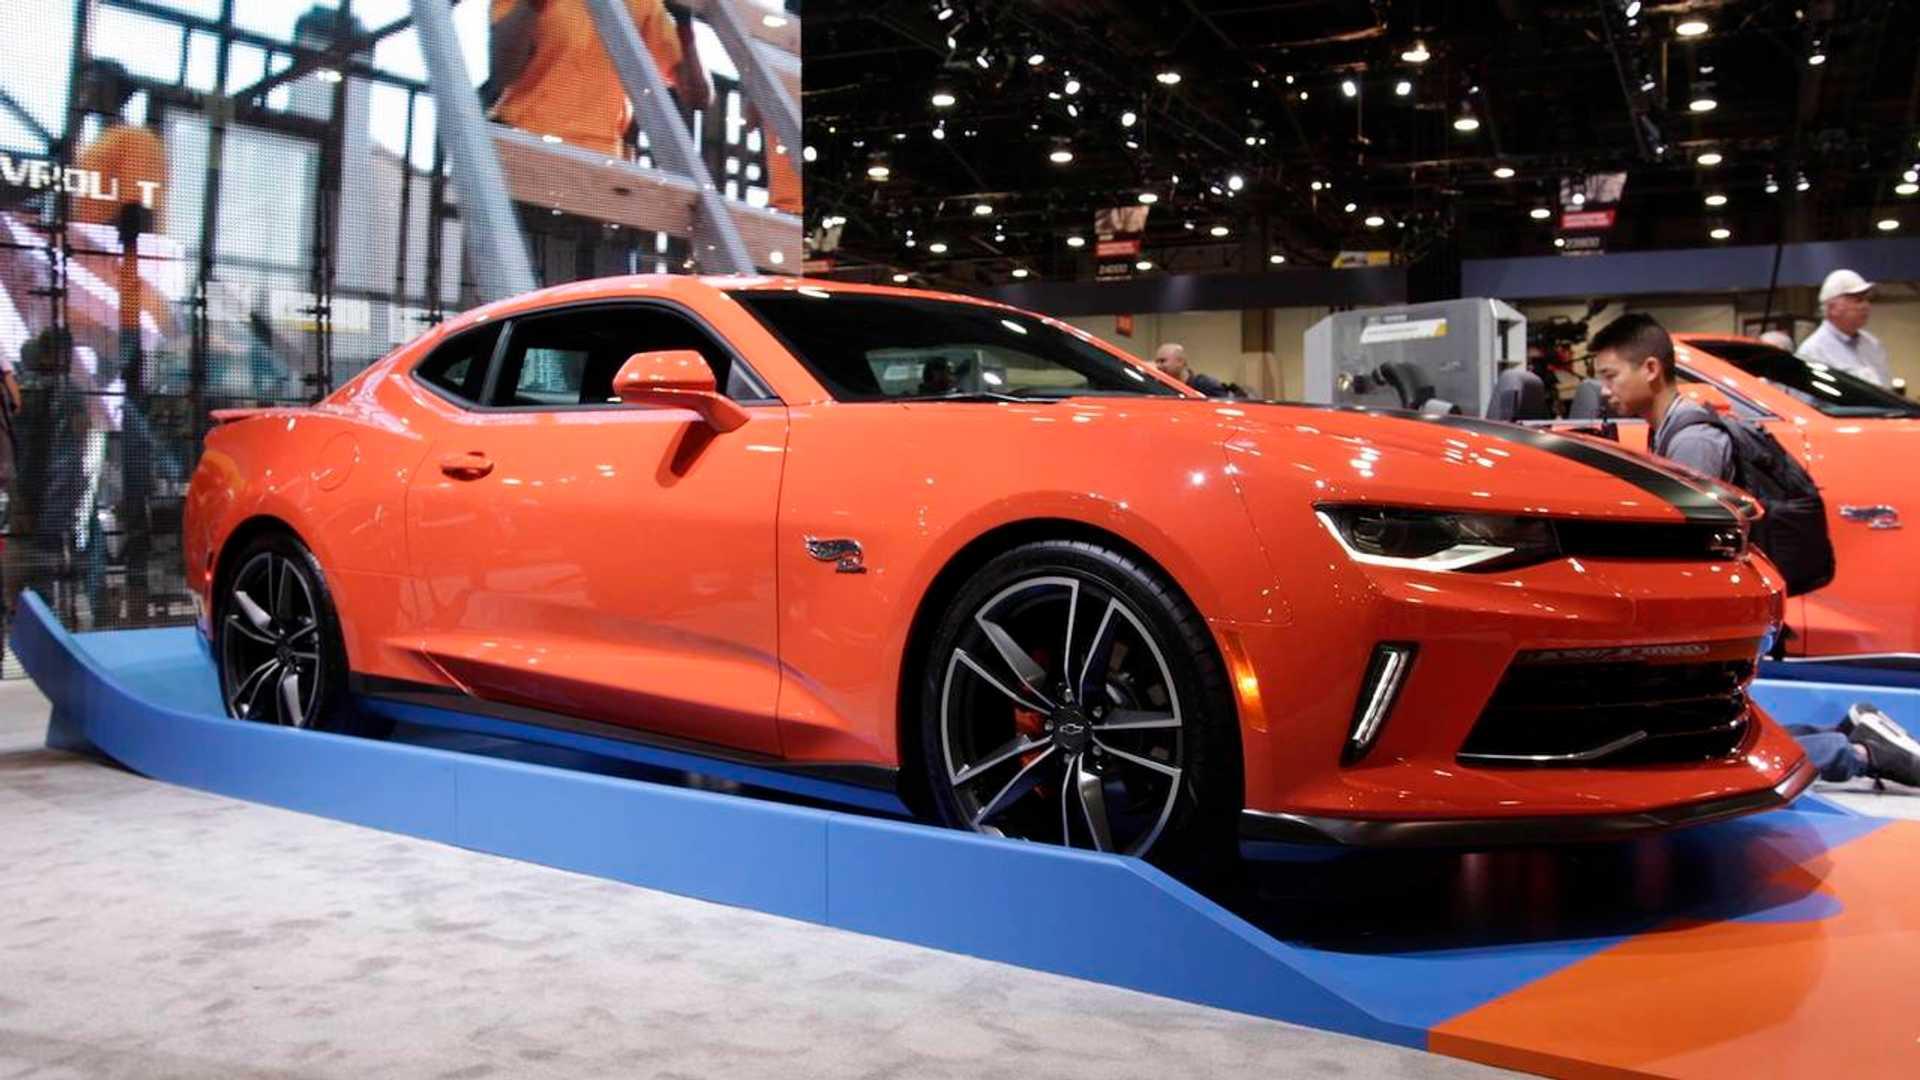 Hot Wheels 2018 Chevy Camaro Brings Childhood Dreams To Life